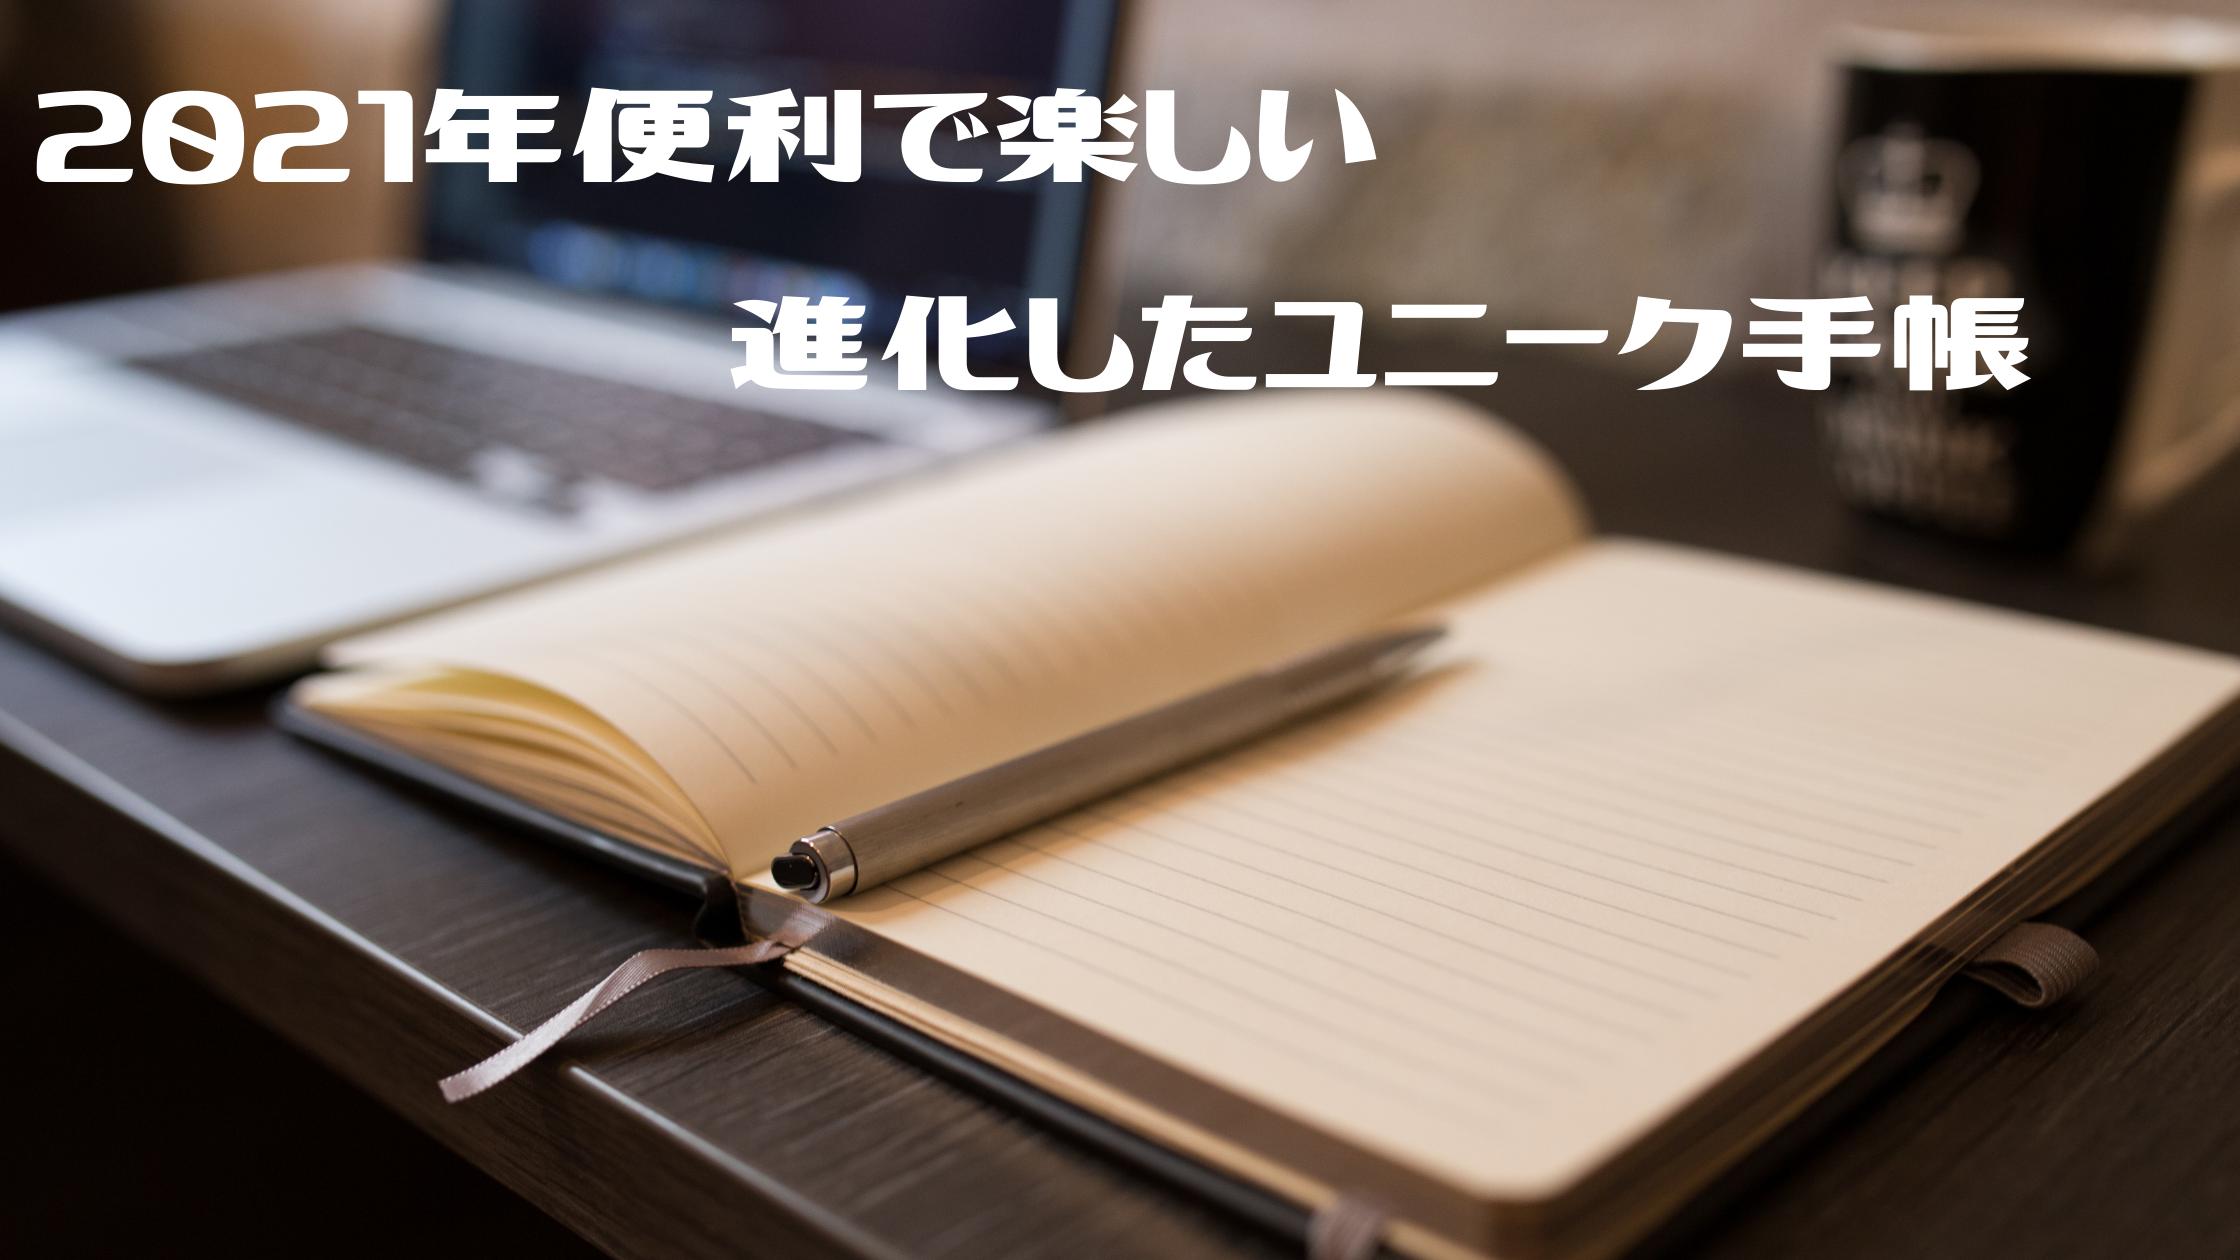 【ZIP】進化したユニーク手帳『折りたためる手帳』『便利で楽しい』『狭いデスク大活躍』